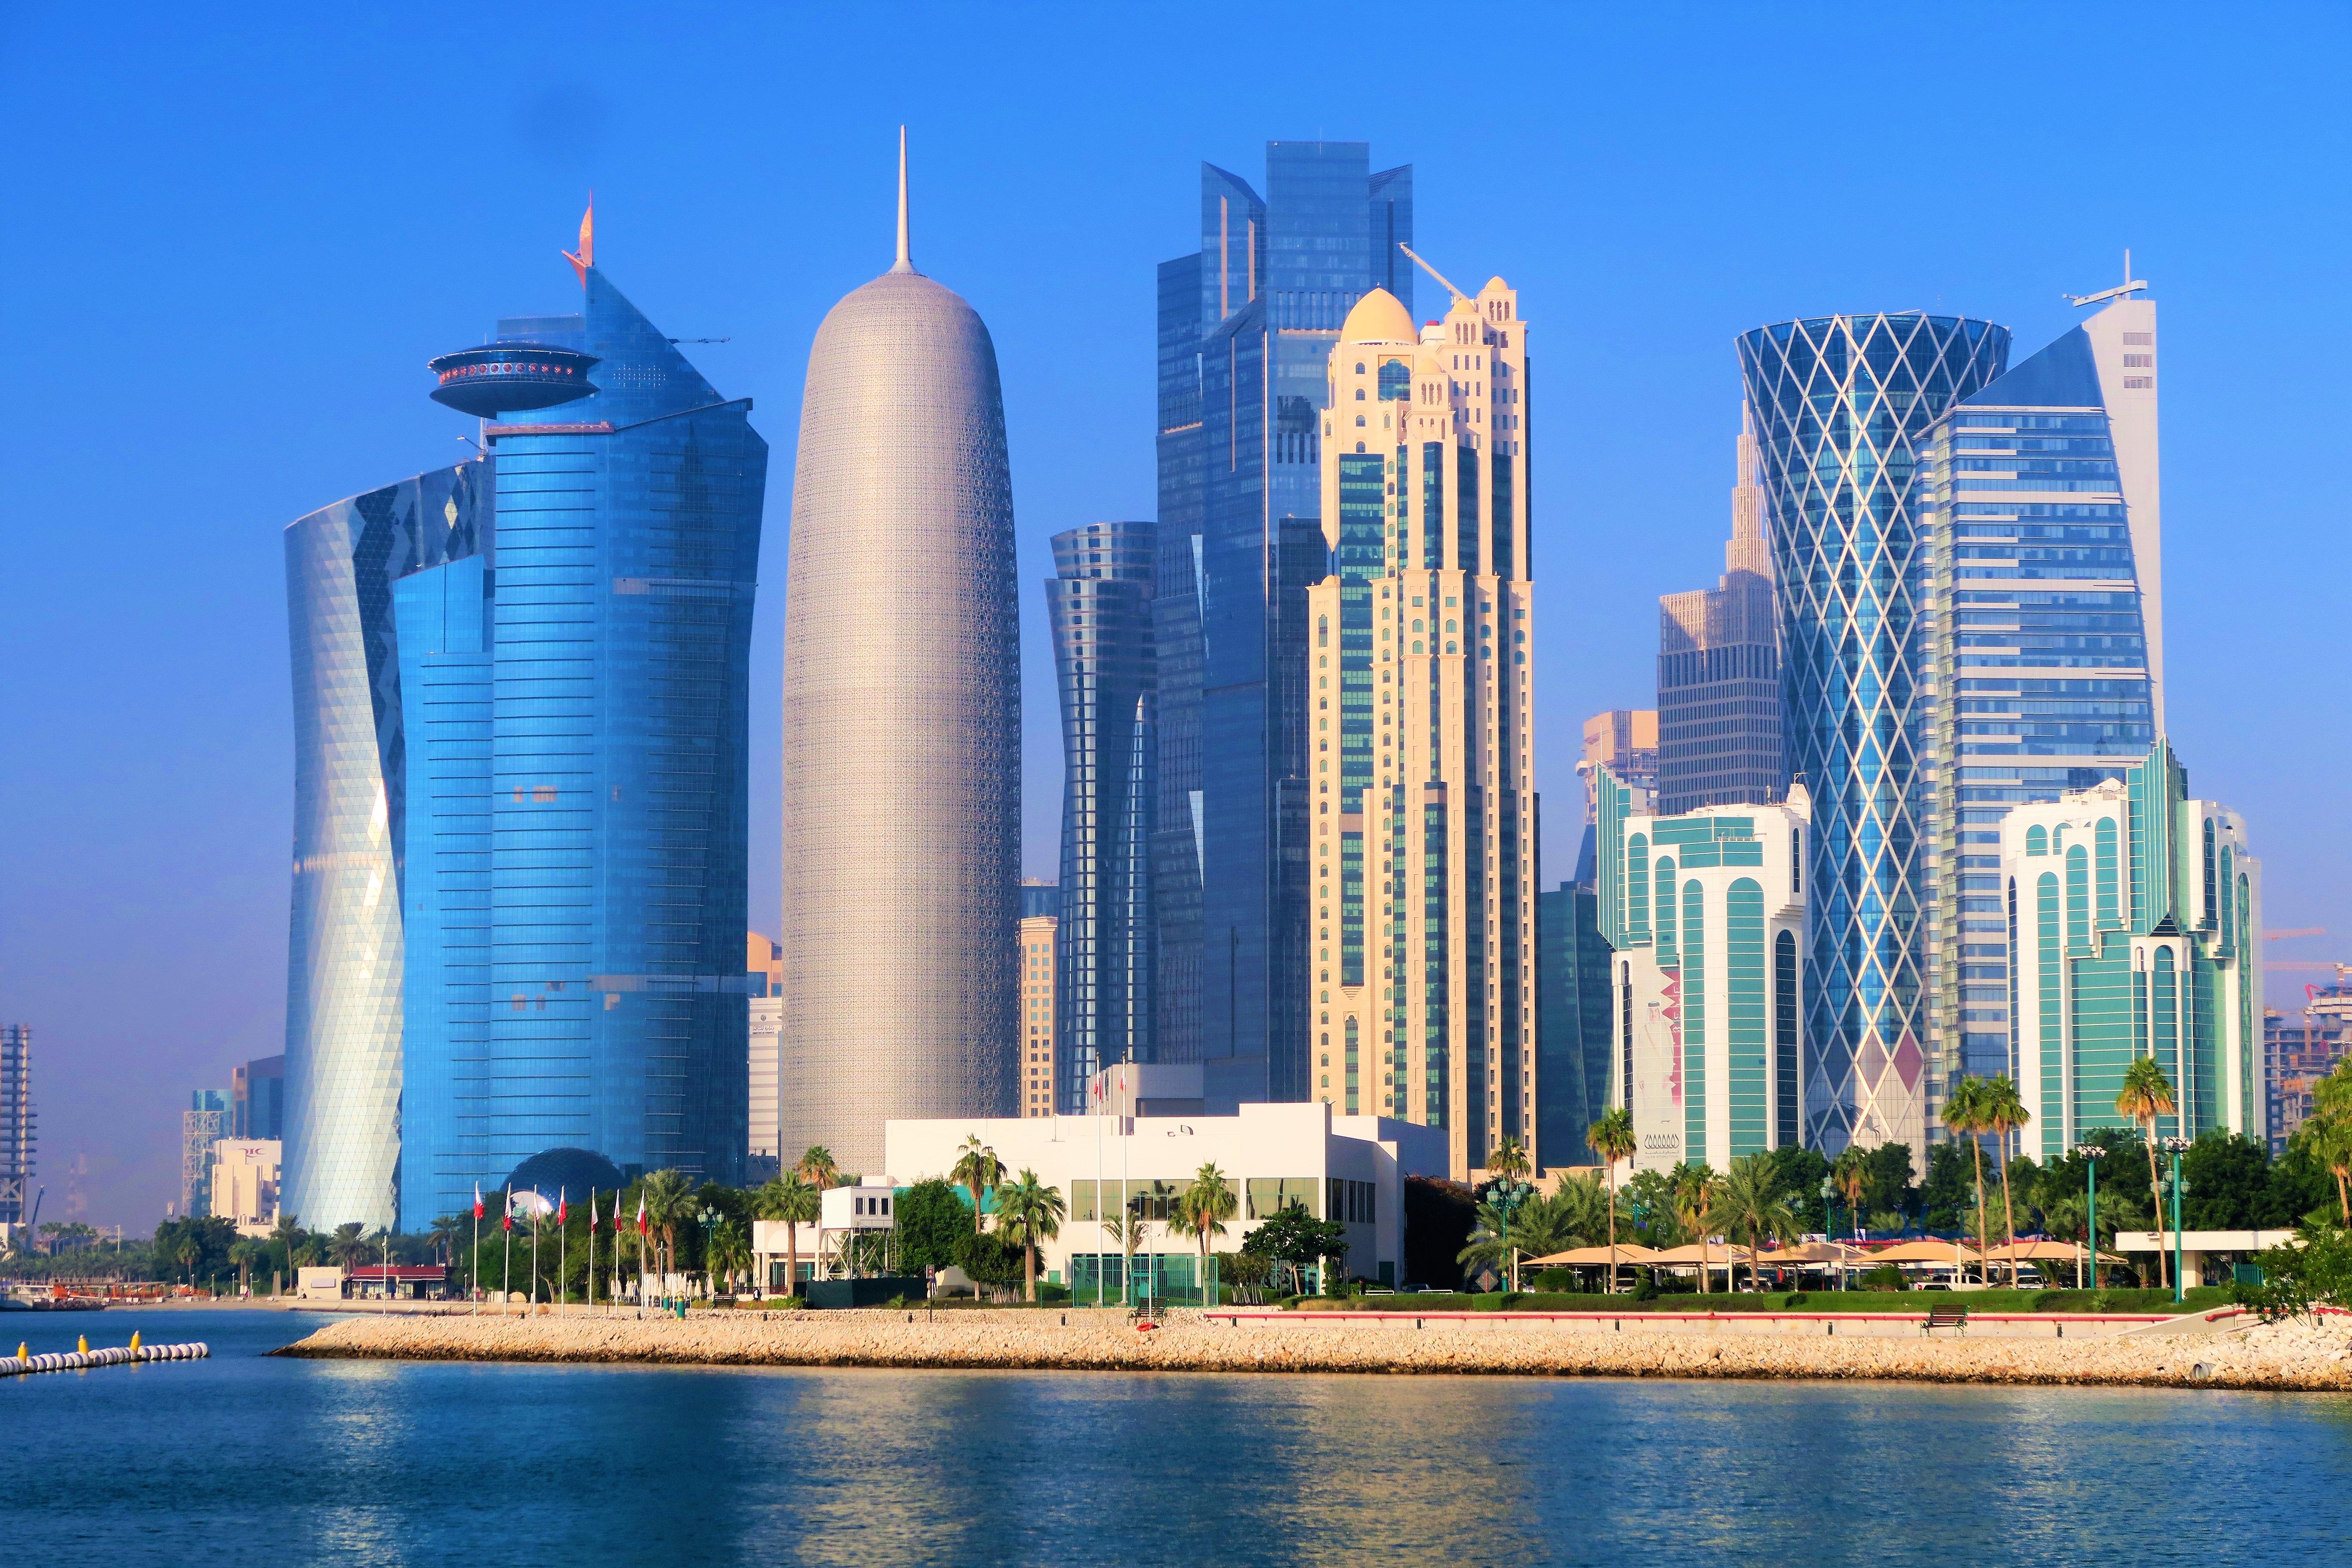 qatar_skyscrapers-3850732.jpg?1574687803